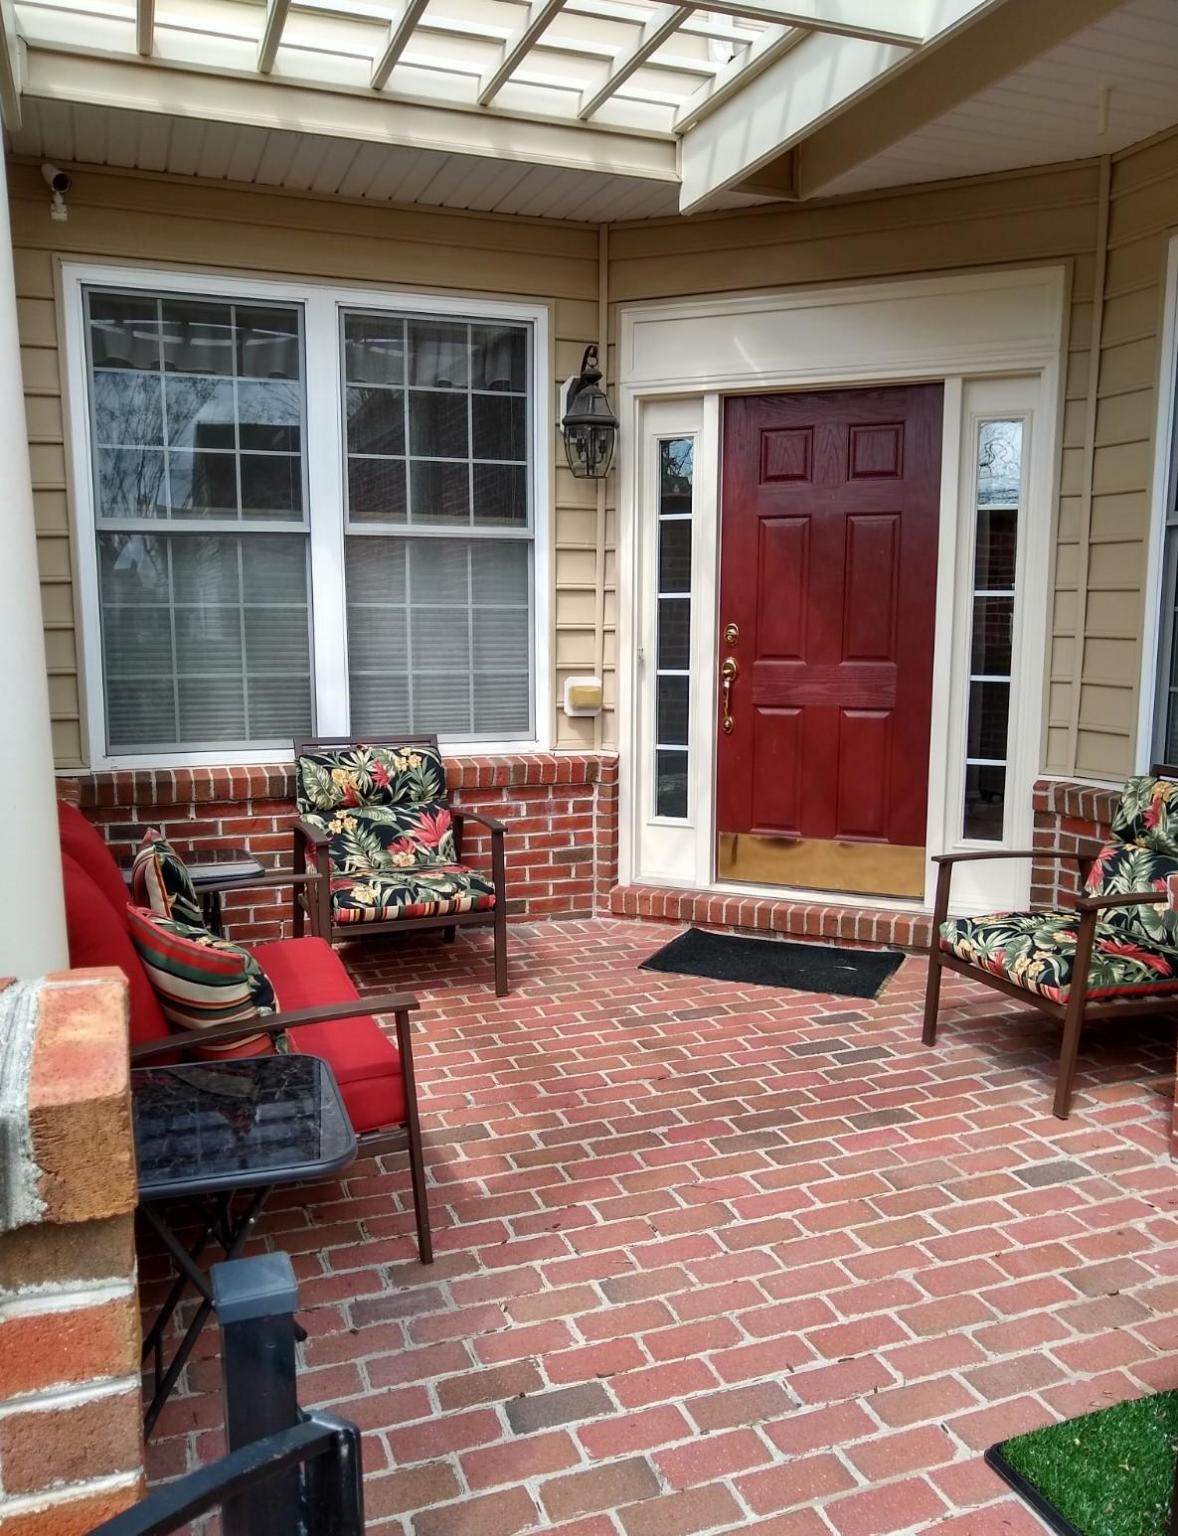 Adare Manor Sq and Crescent Pointe Pl, Ashburn, VA 20147 - 1 Bed, 1 Bath  Room For Rent - 3 Photos | Trulia